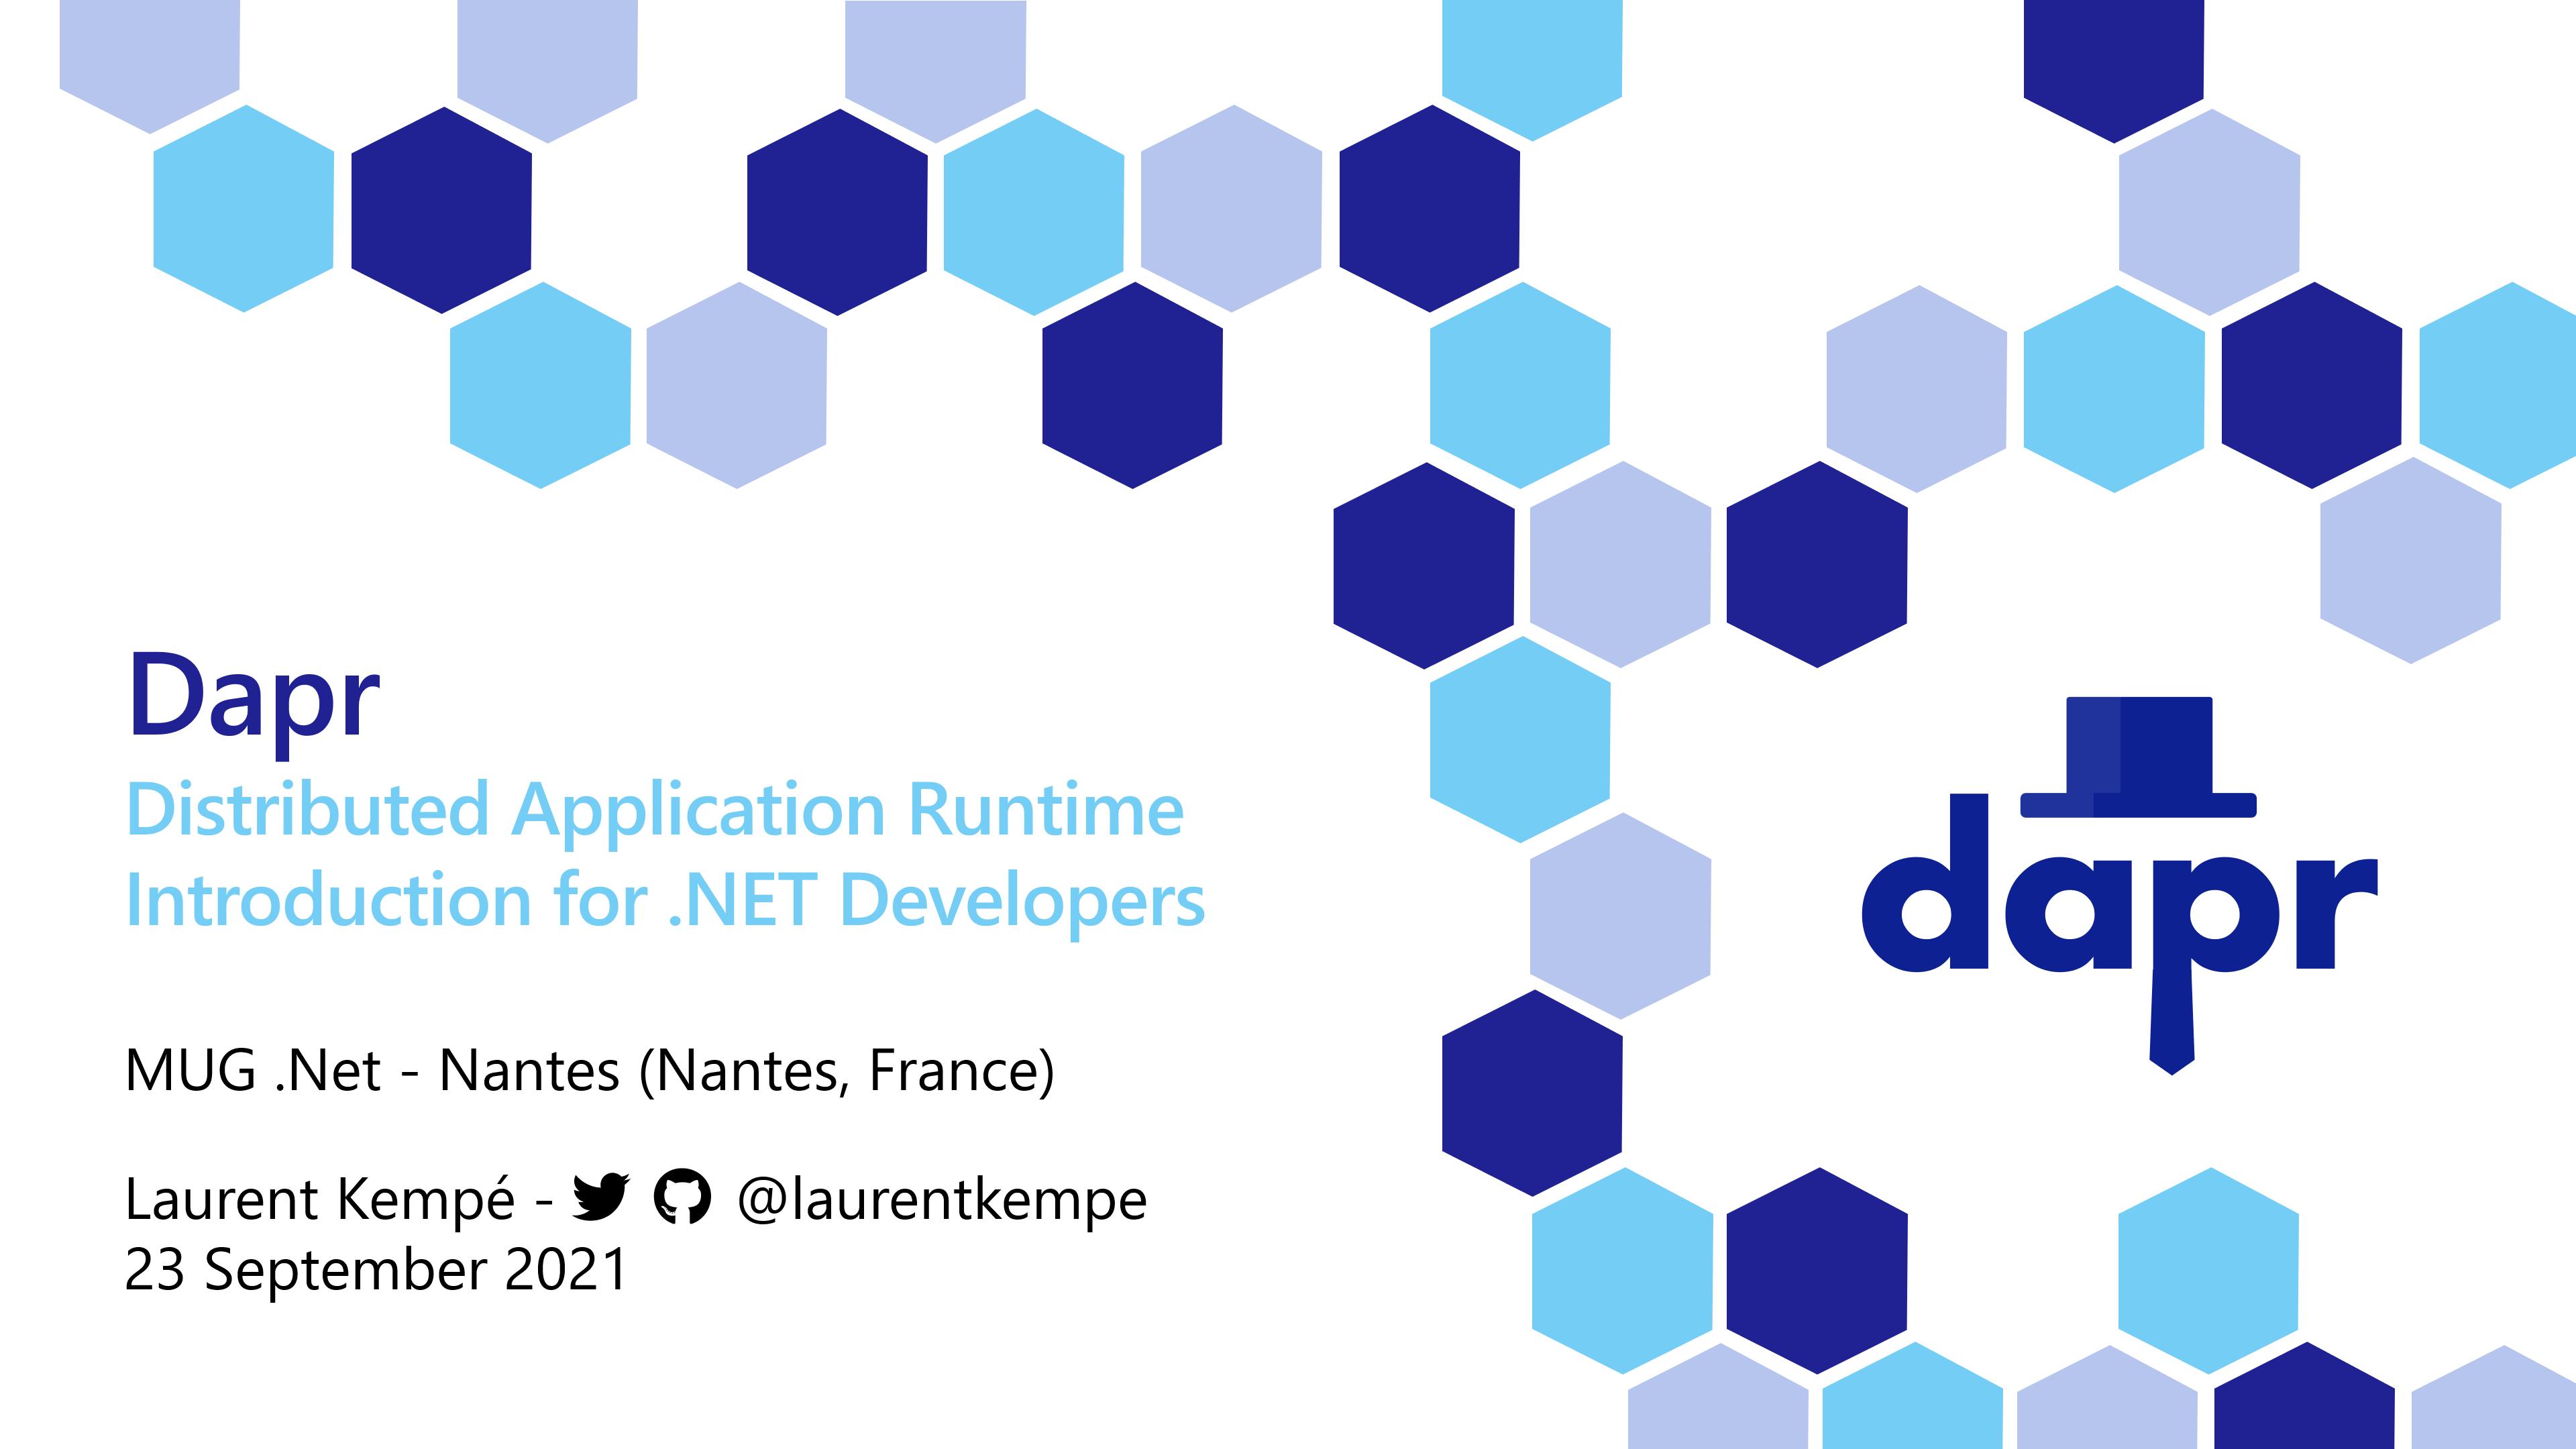 image - MUG Nantes - Dapr : Introduction for .Net Developers